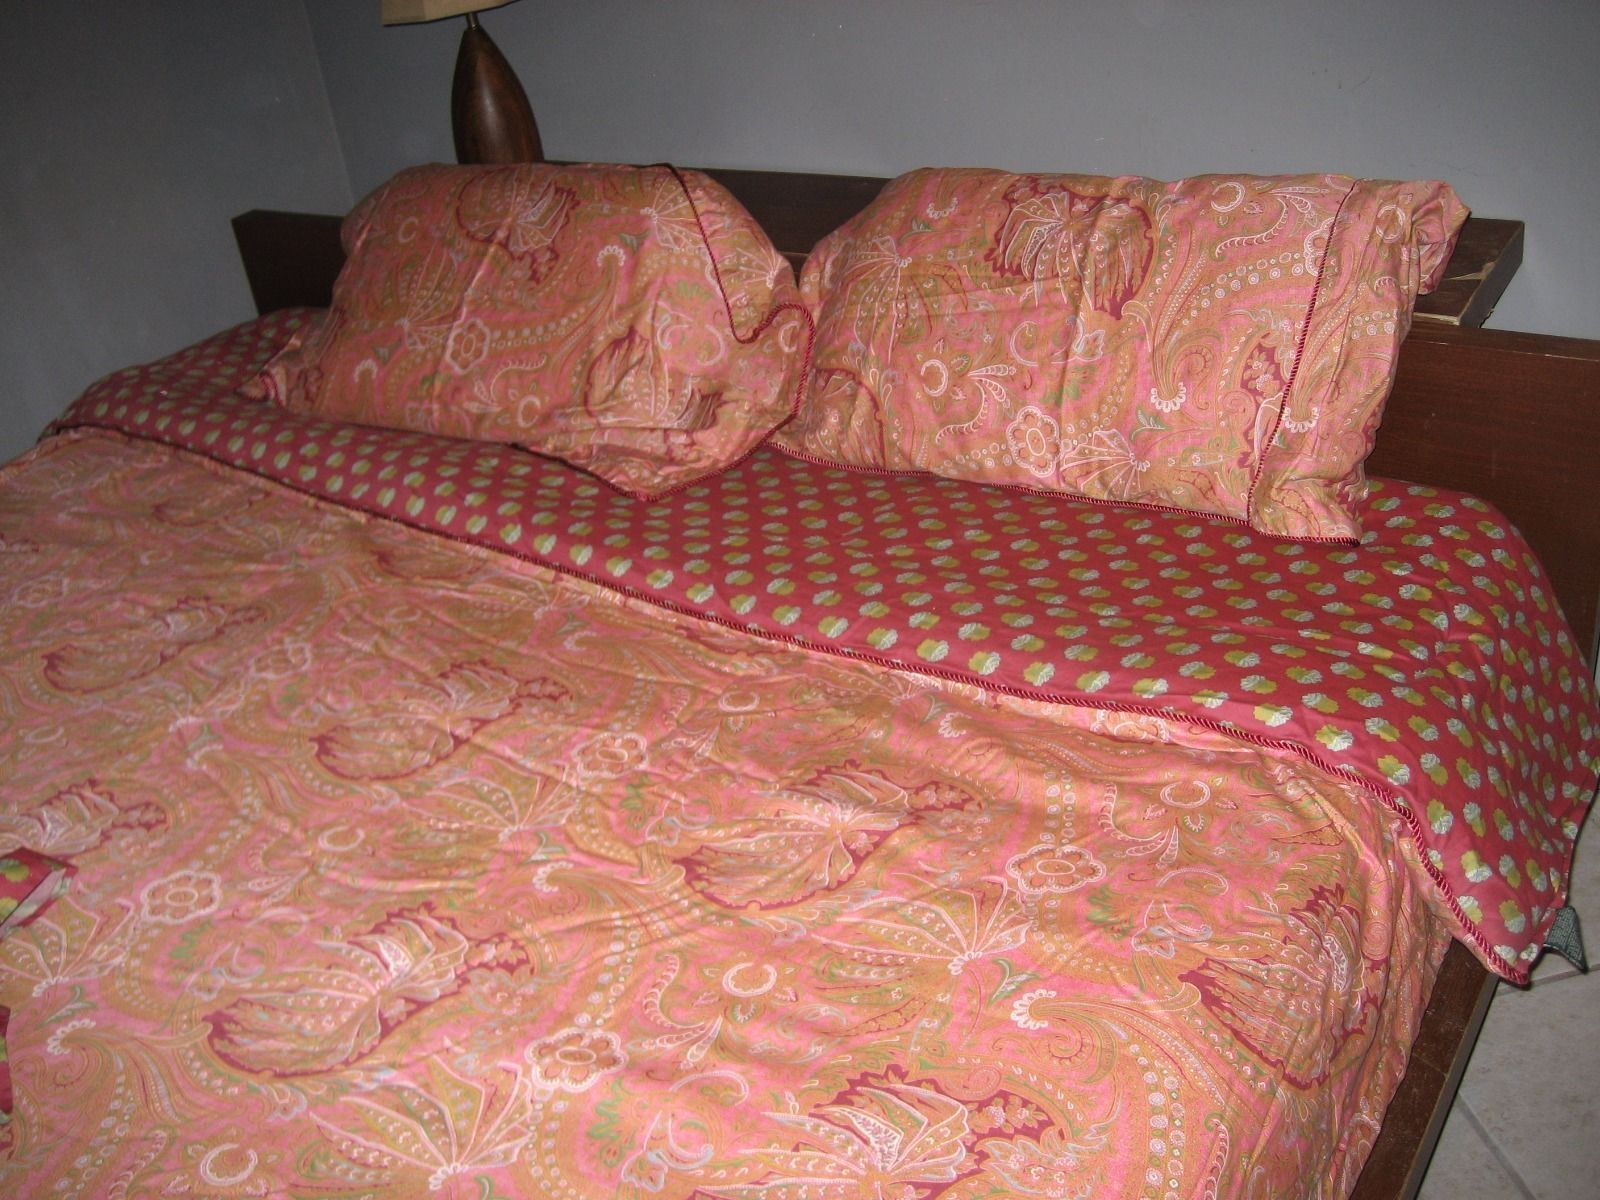 ah comforter king staggering retro bedding duvet comforters nicole cheerful set cover elephant miller twin piece bedroom marshalls sequin c scenic bedspreads ideas sets lauren ralph by in decoration pattern